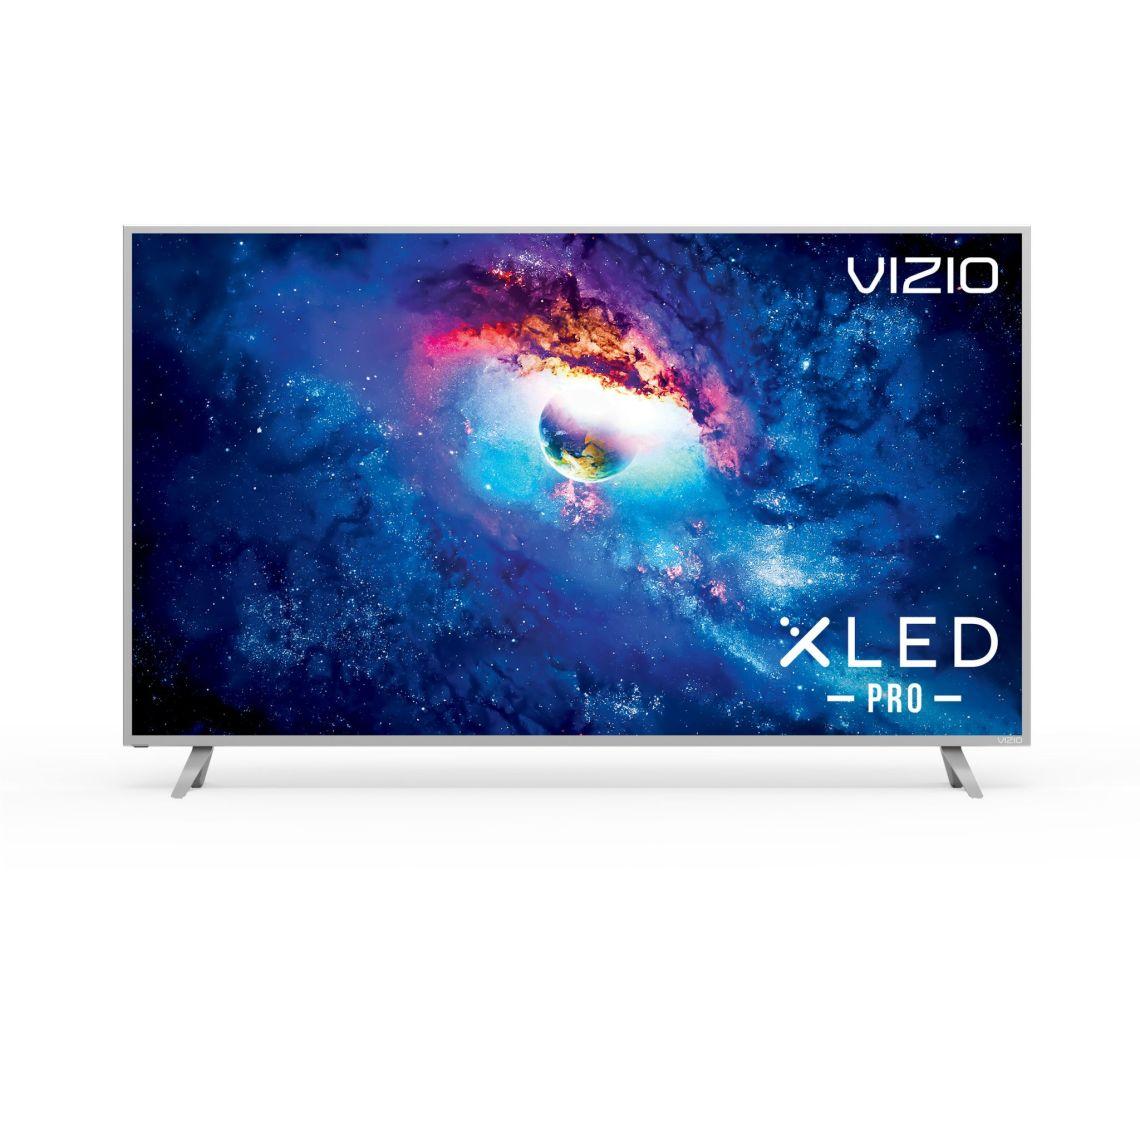 "VIZIO 65"" Class 4K (2160P) Smart XLED Home Theater Display (P65-E1) - Walmart.com"